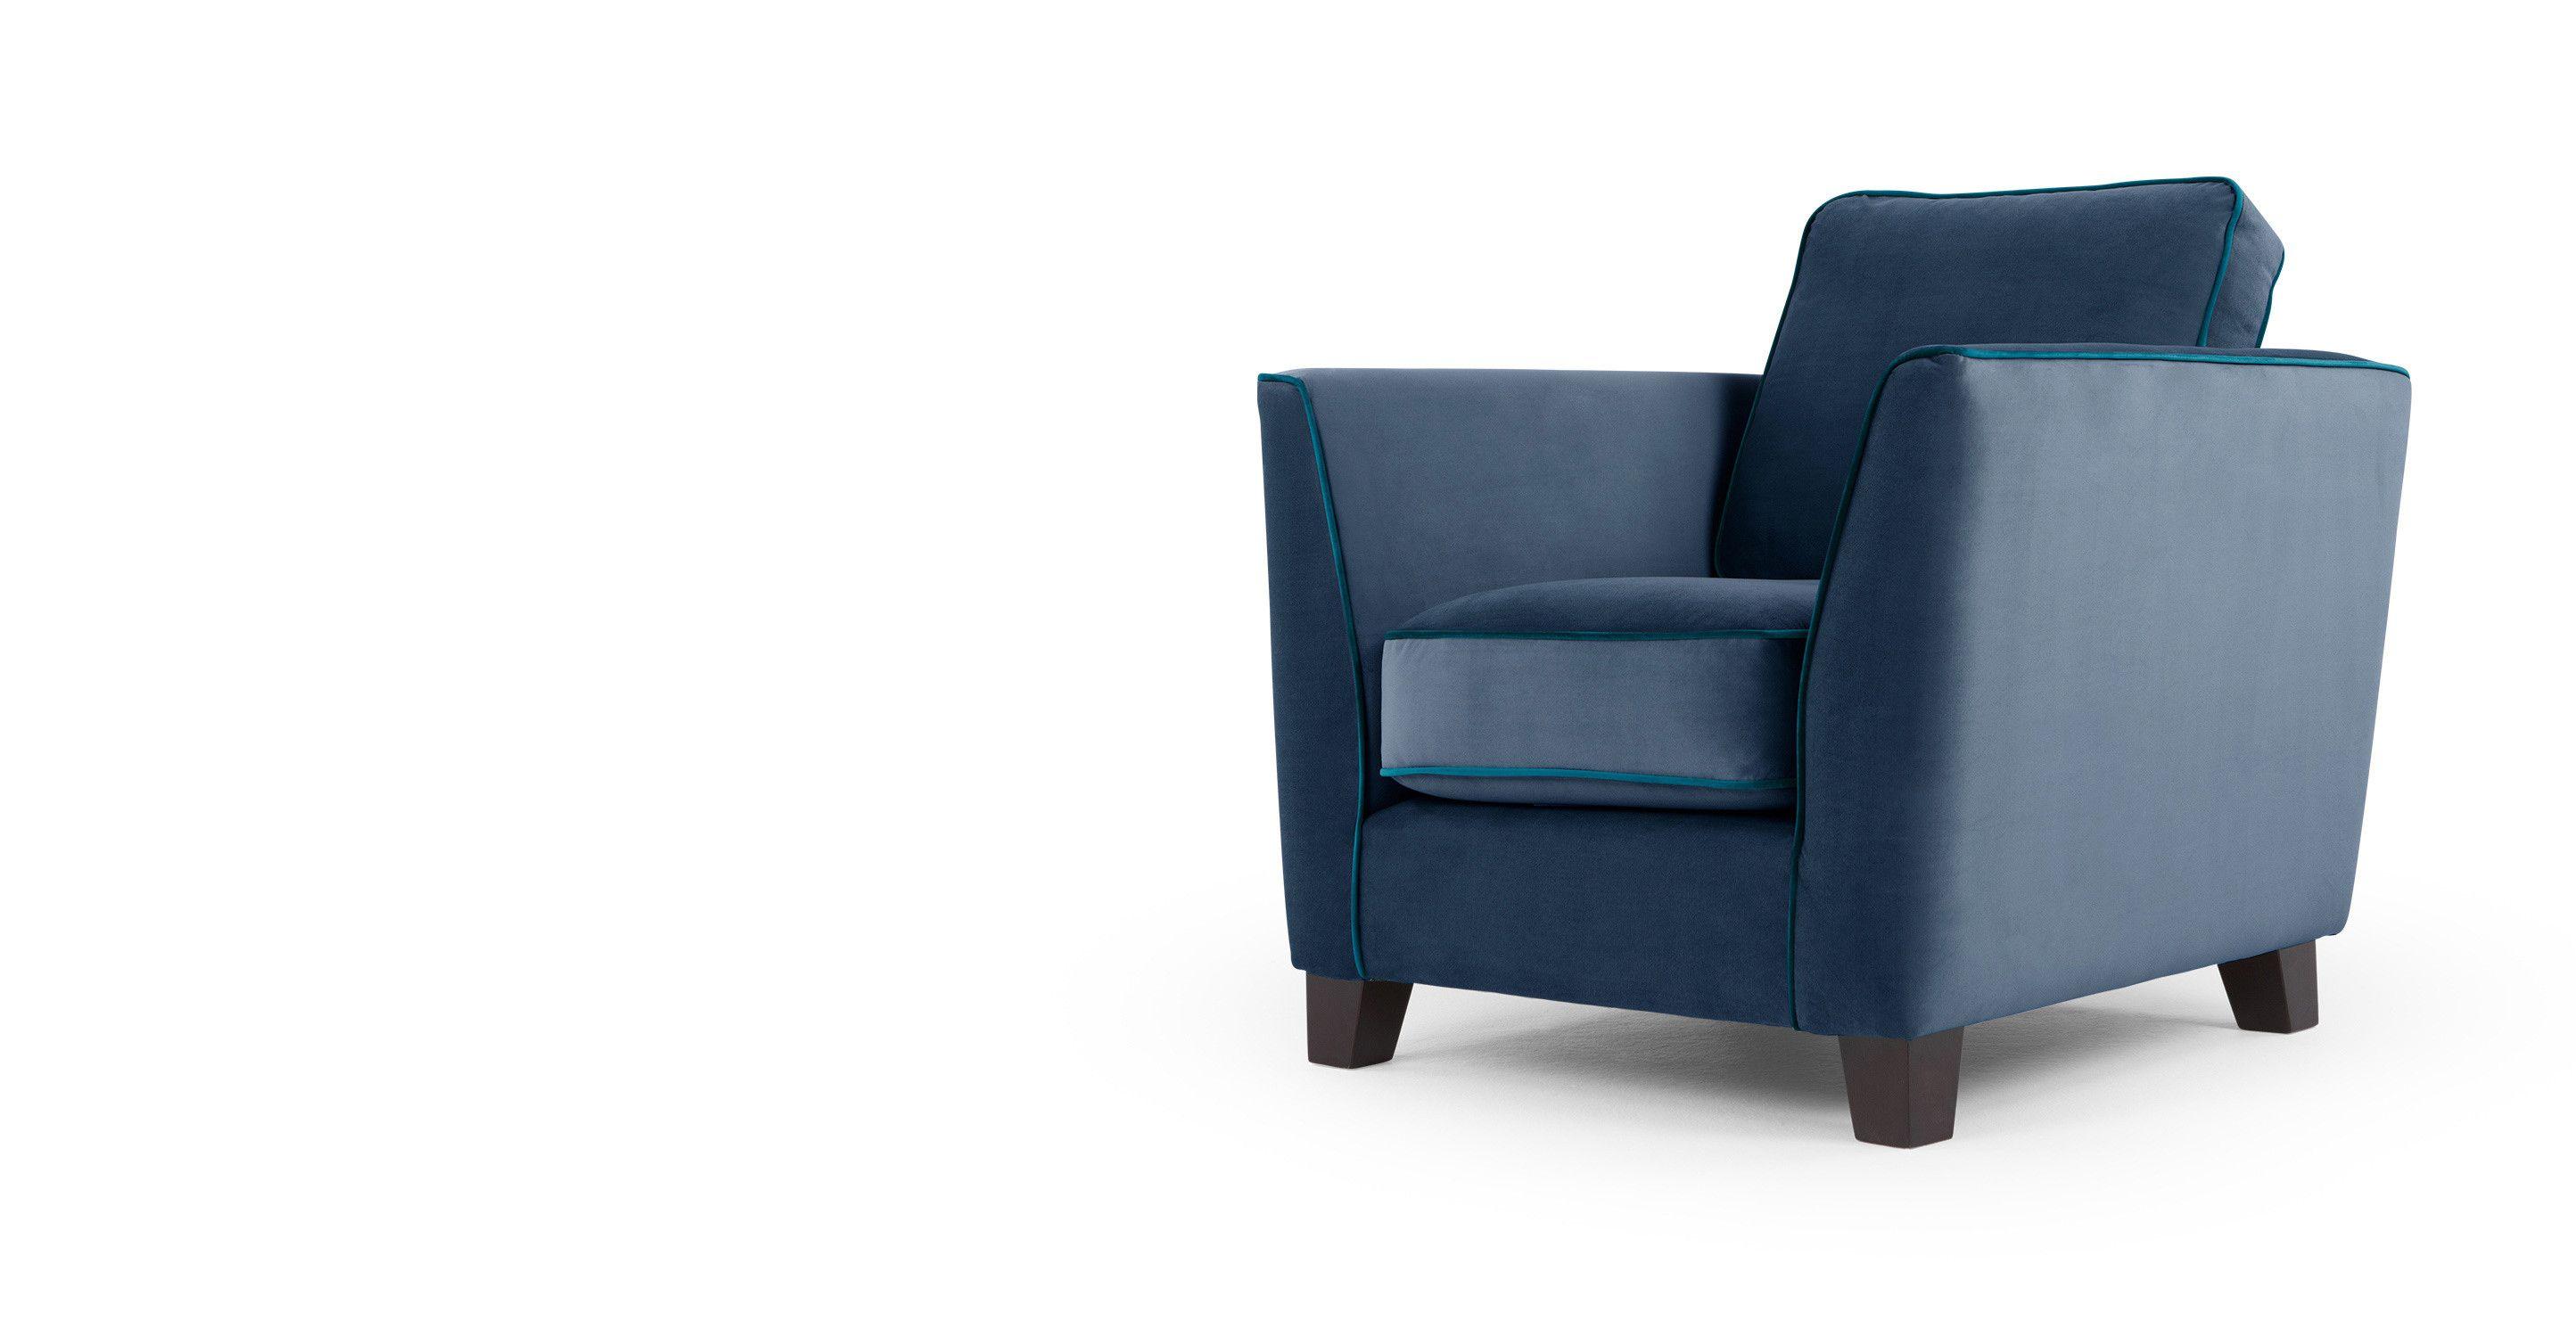 Wolseley un fauteuil velours bleu marine